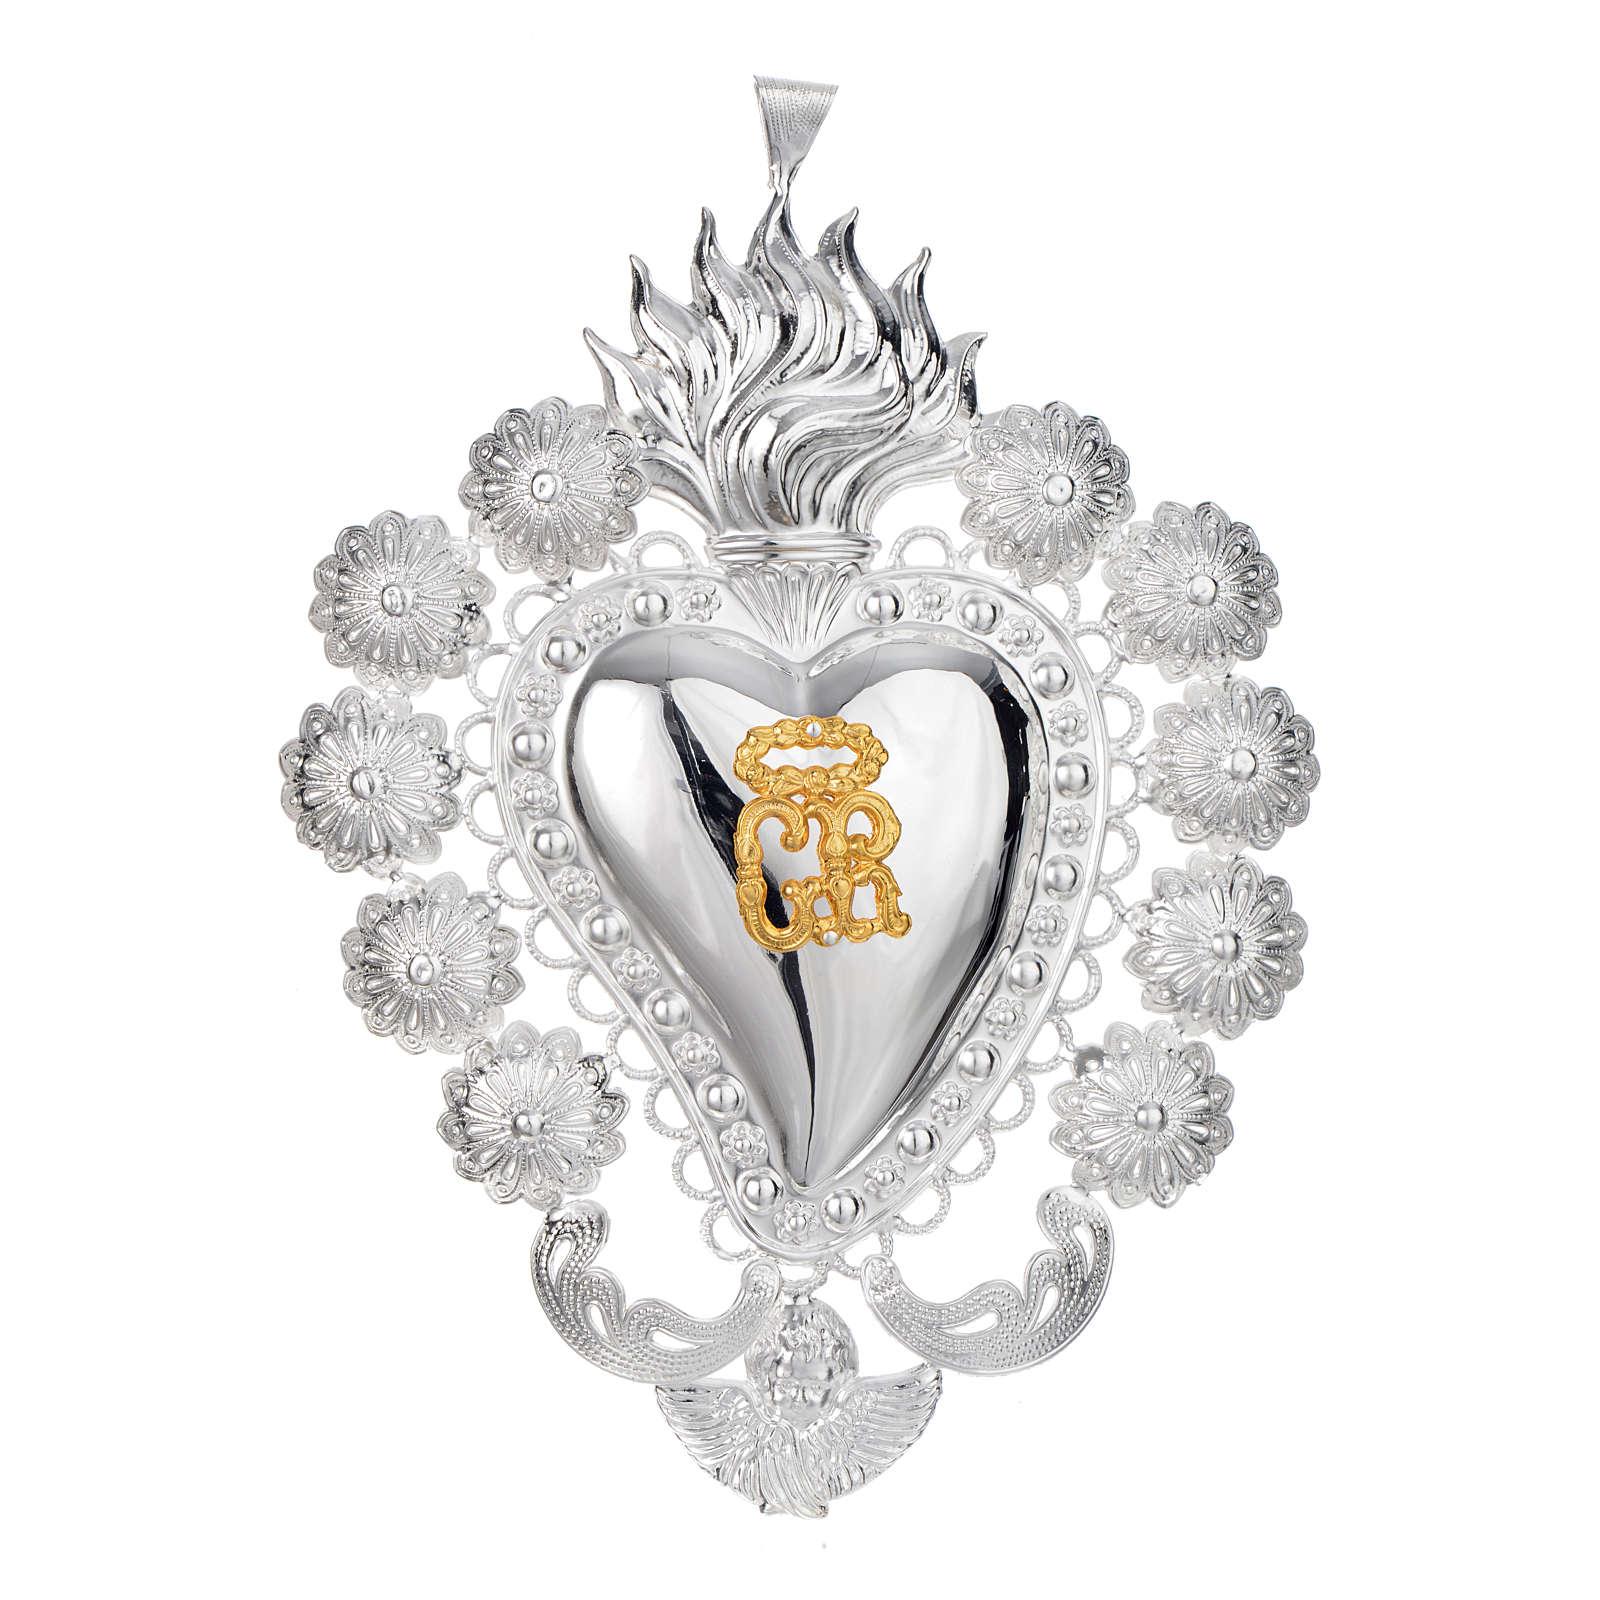 Coeur votif filigrane 15x20 cm 3